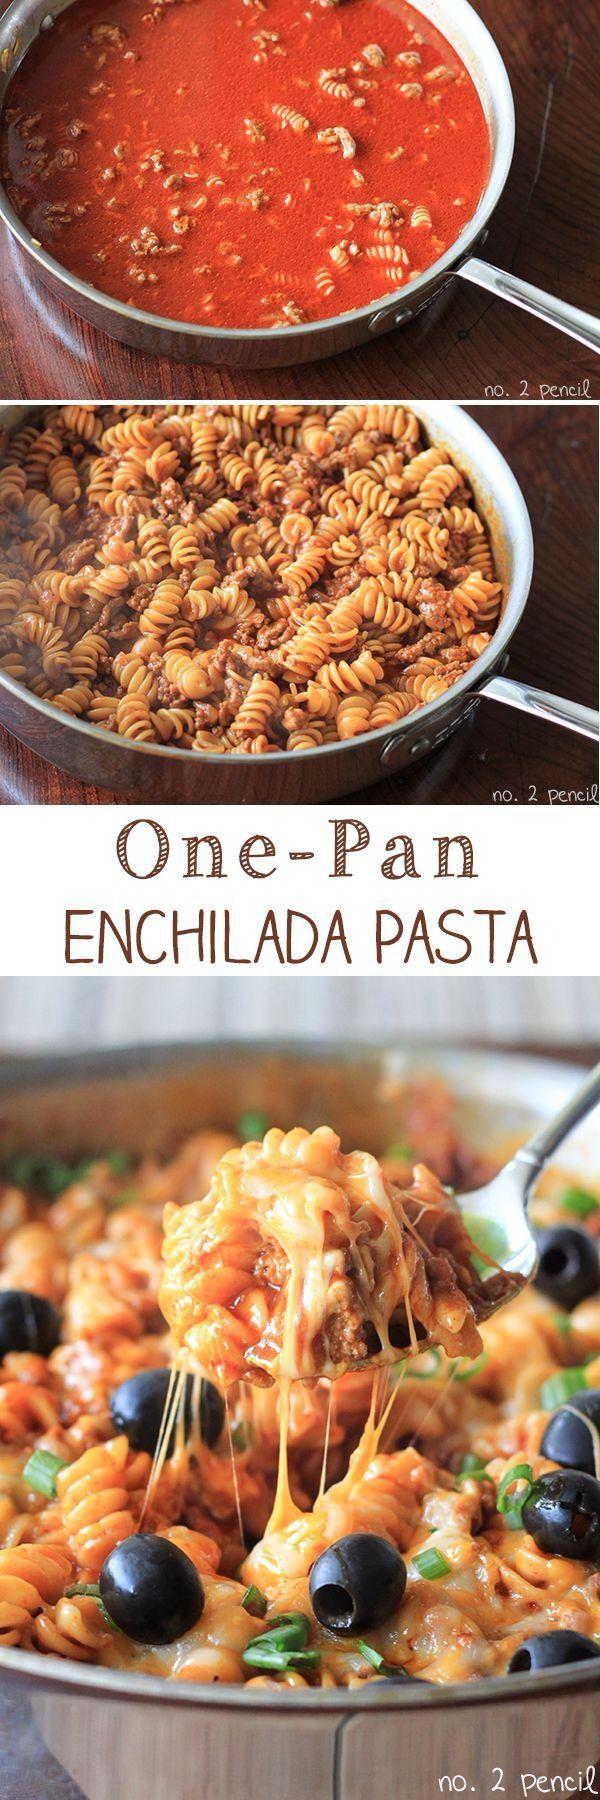 One pan enchilada pasta - yum! looks good & easy!